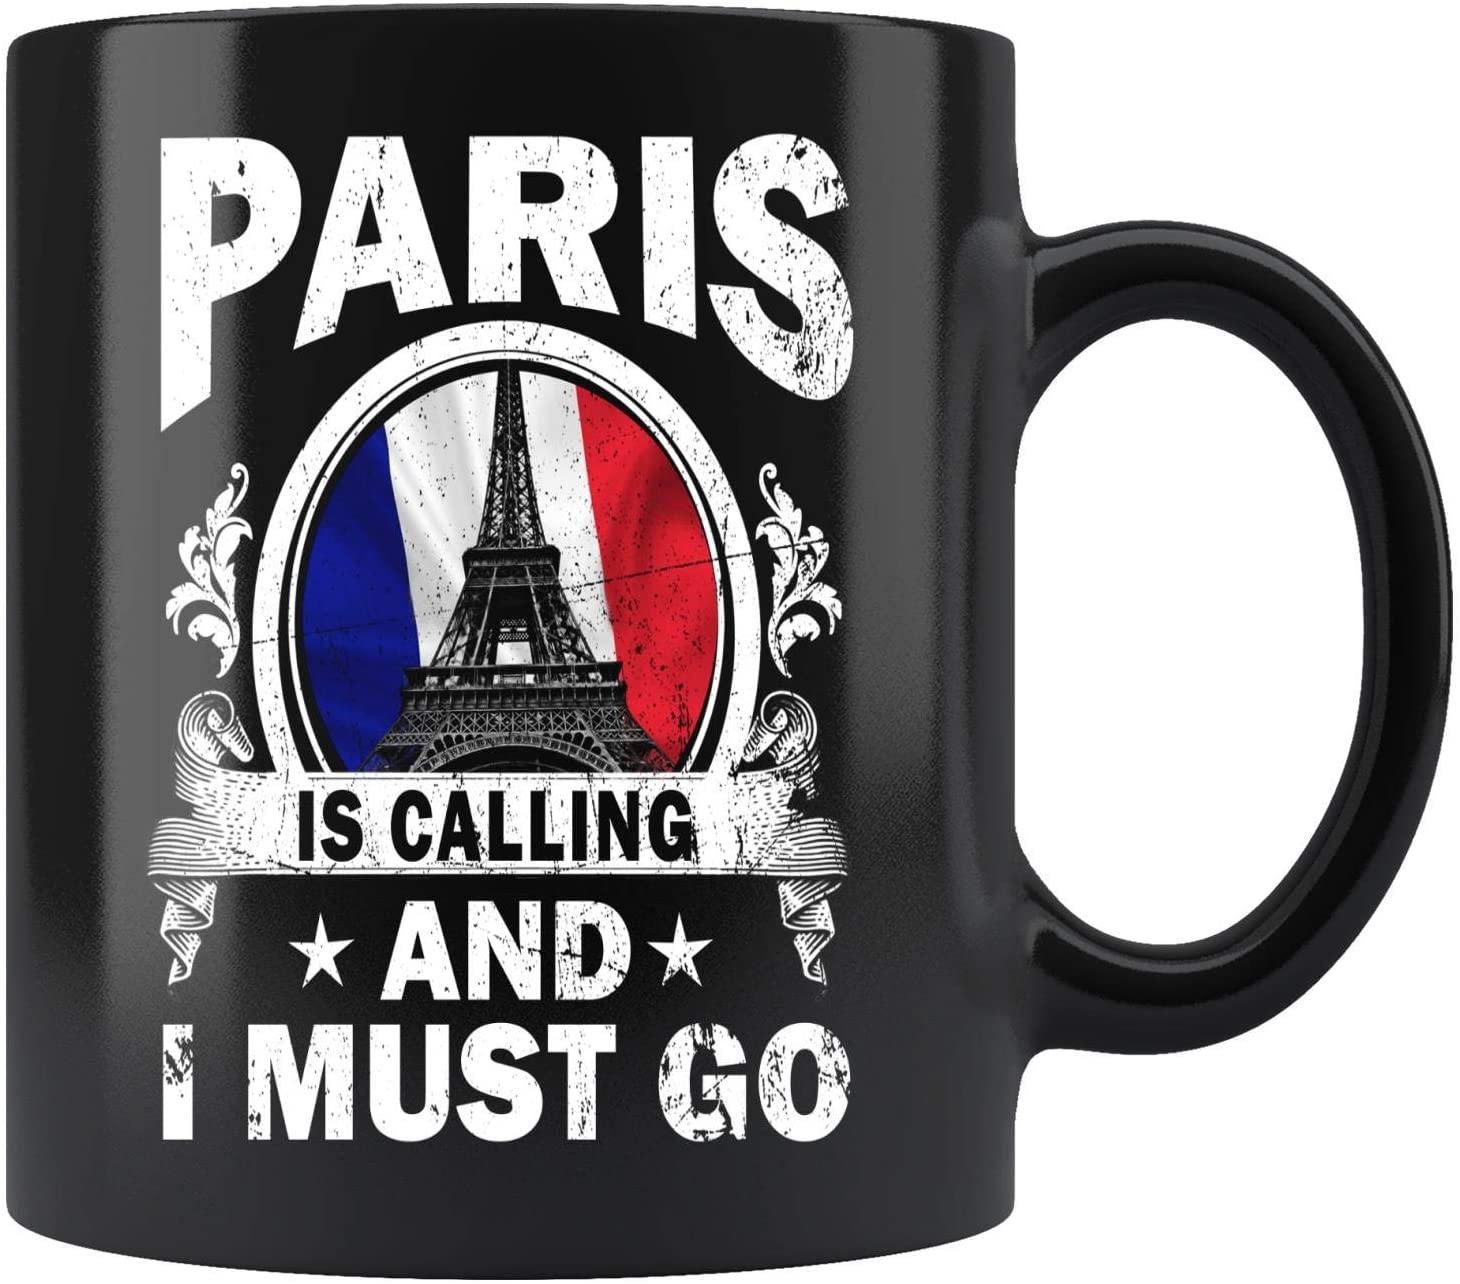 Paris Is Calling And I Must Go Mug Coffee Mug 11oz Gift Tea Cups 15oz